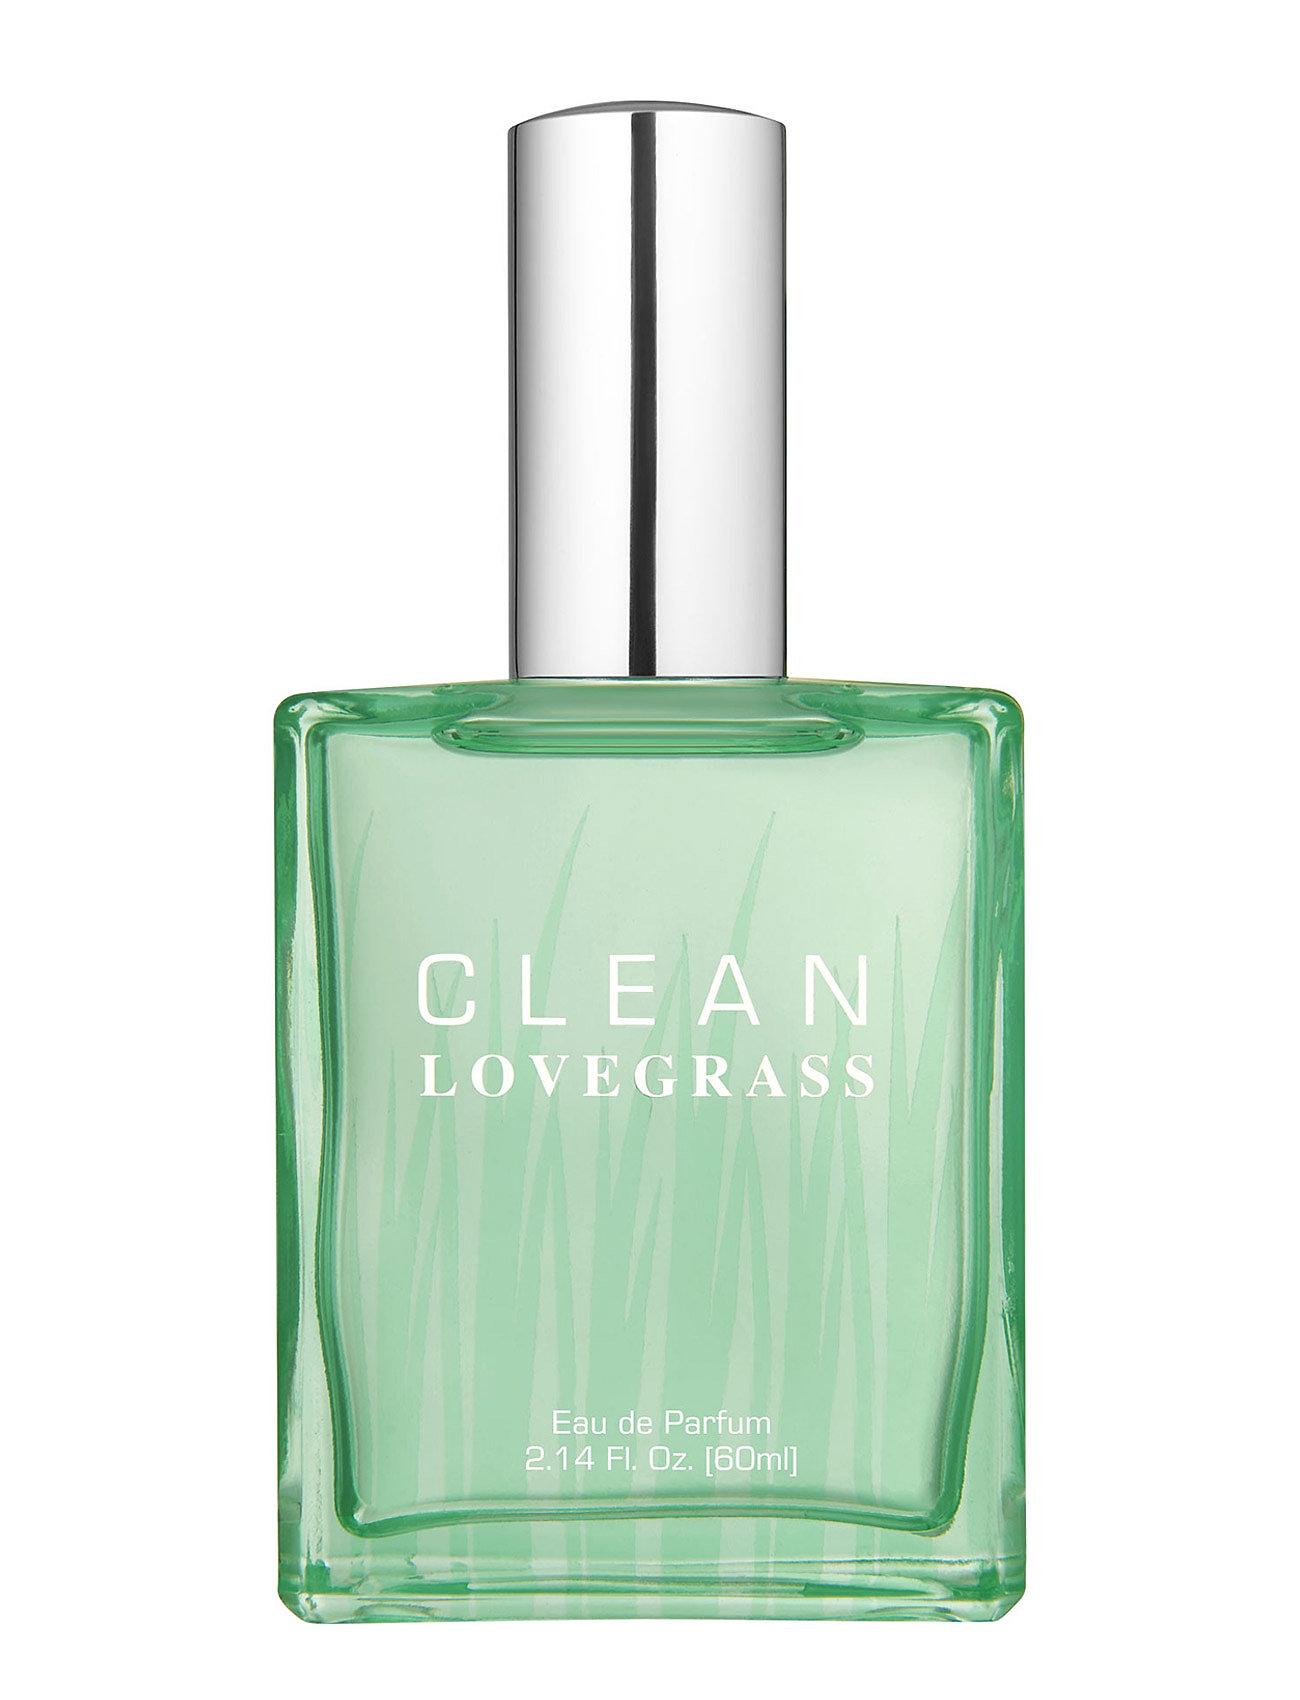 clean Love grass på boozt.com dk